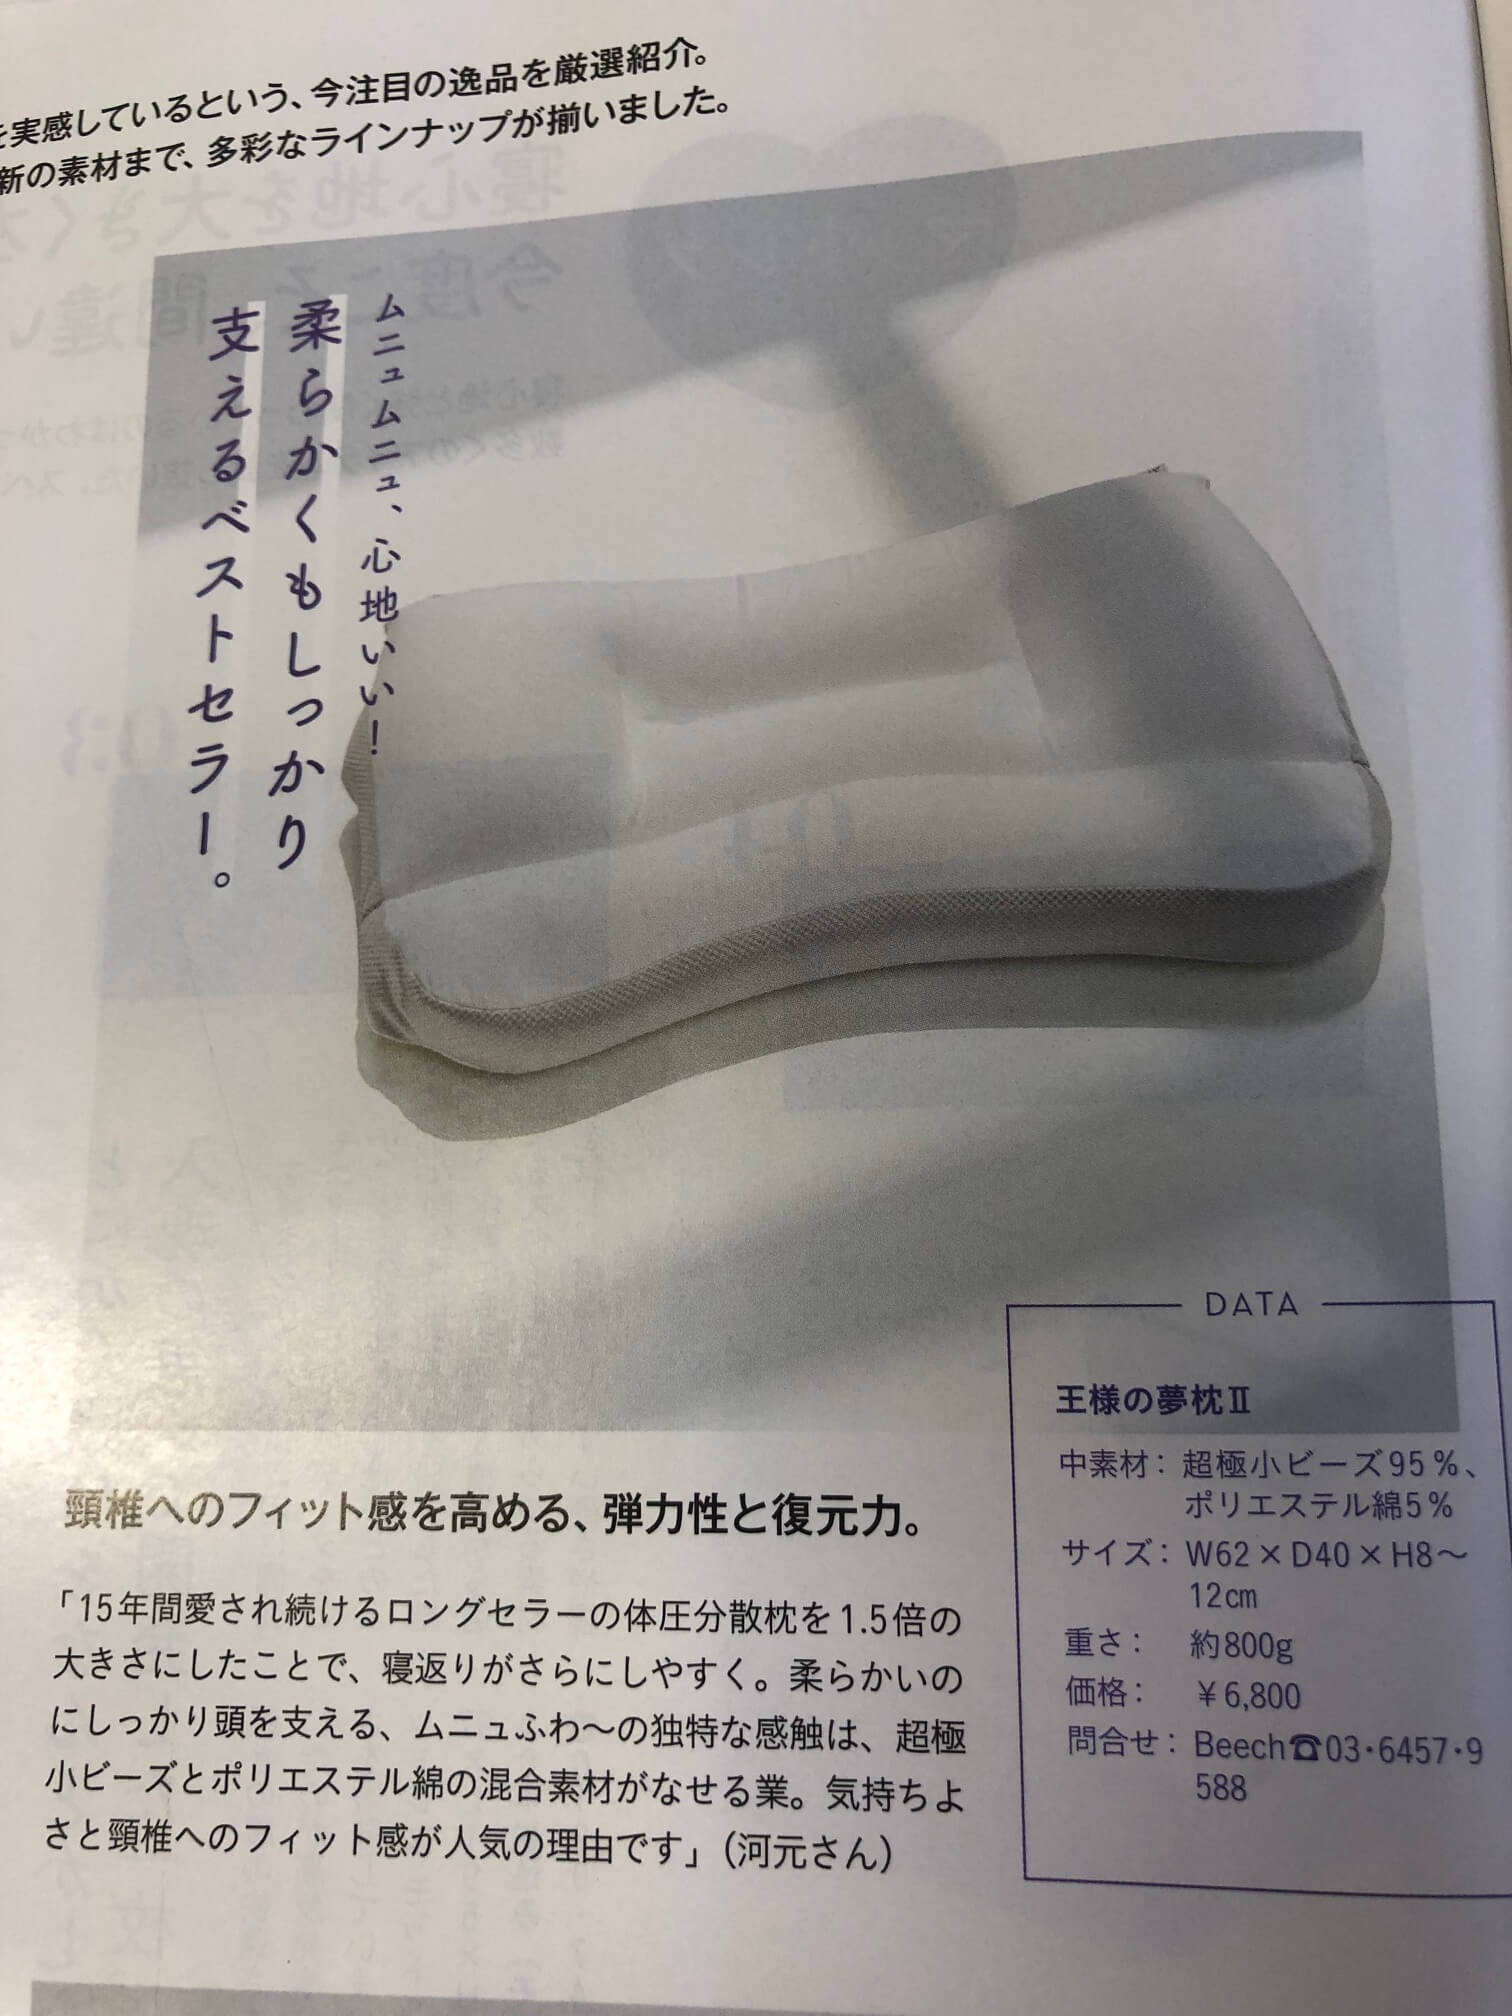 anan 9月11日号 No.2166 王様の夢枕